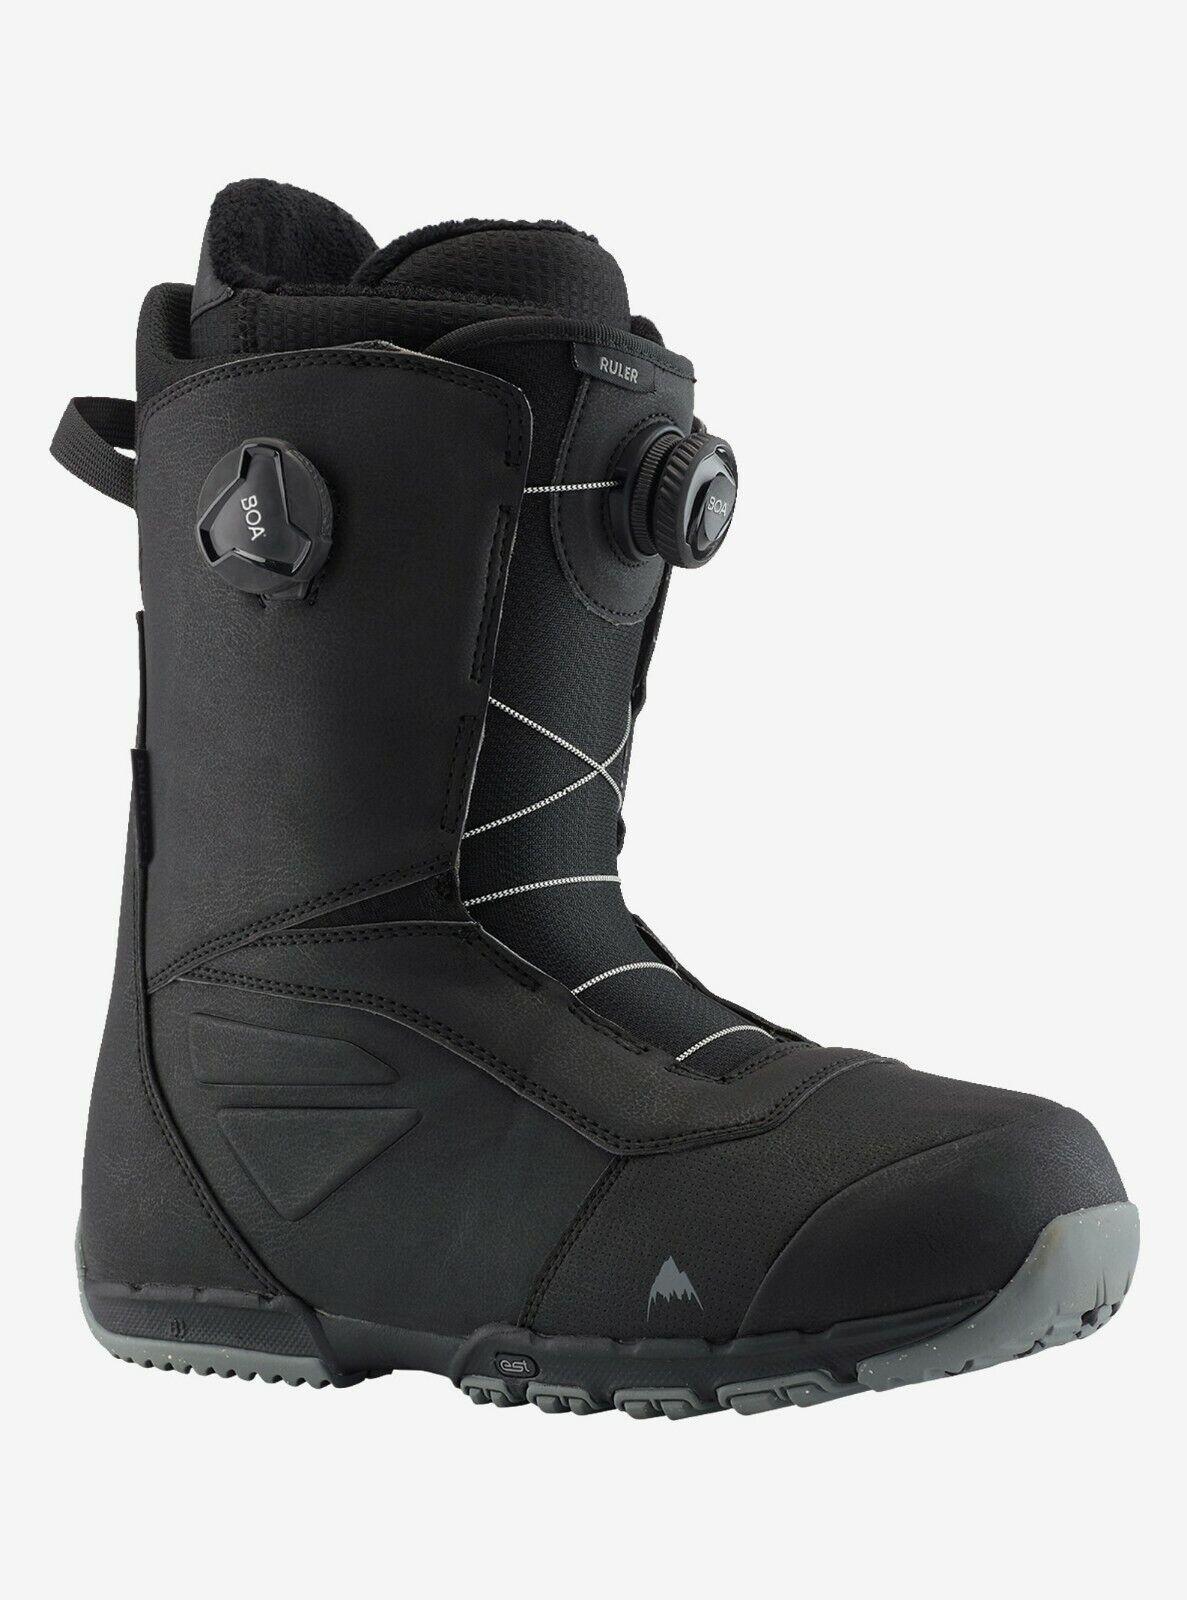 Burton Ruler BOA   2020 - Mens Snowboard Boots   Black